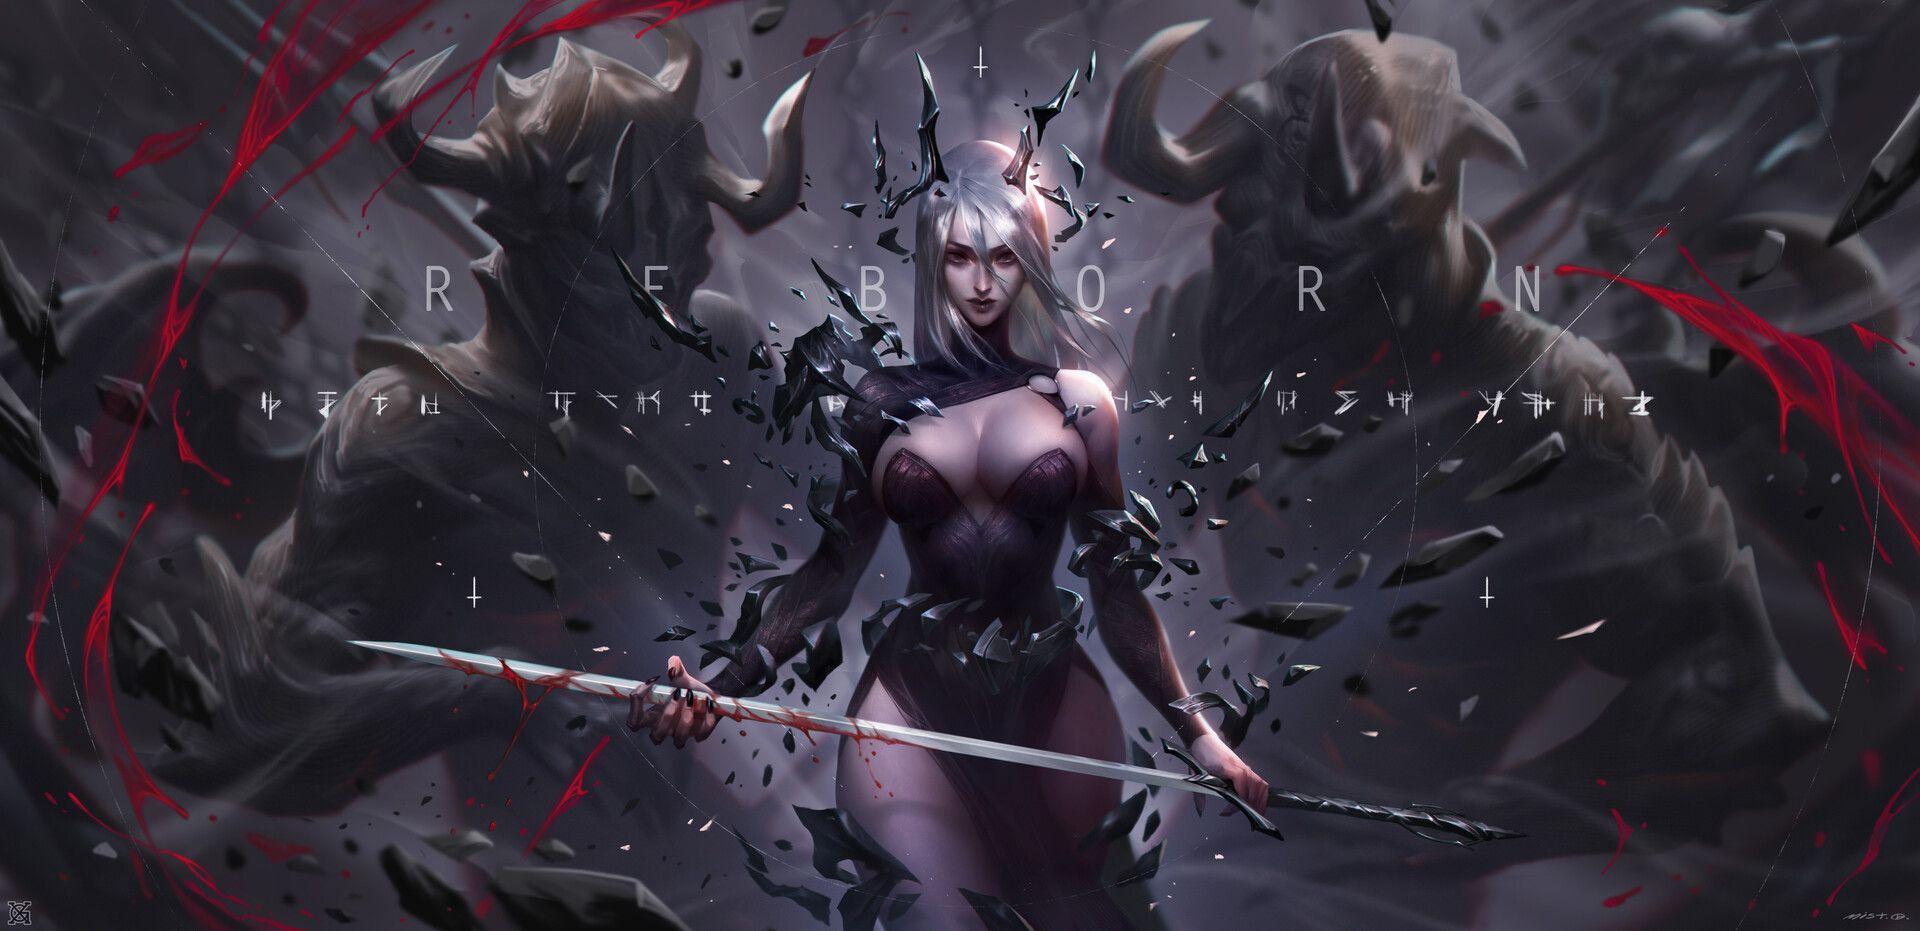 Sacrifice heart, mist XG on ArtStation at https://www